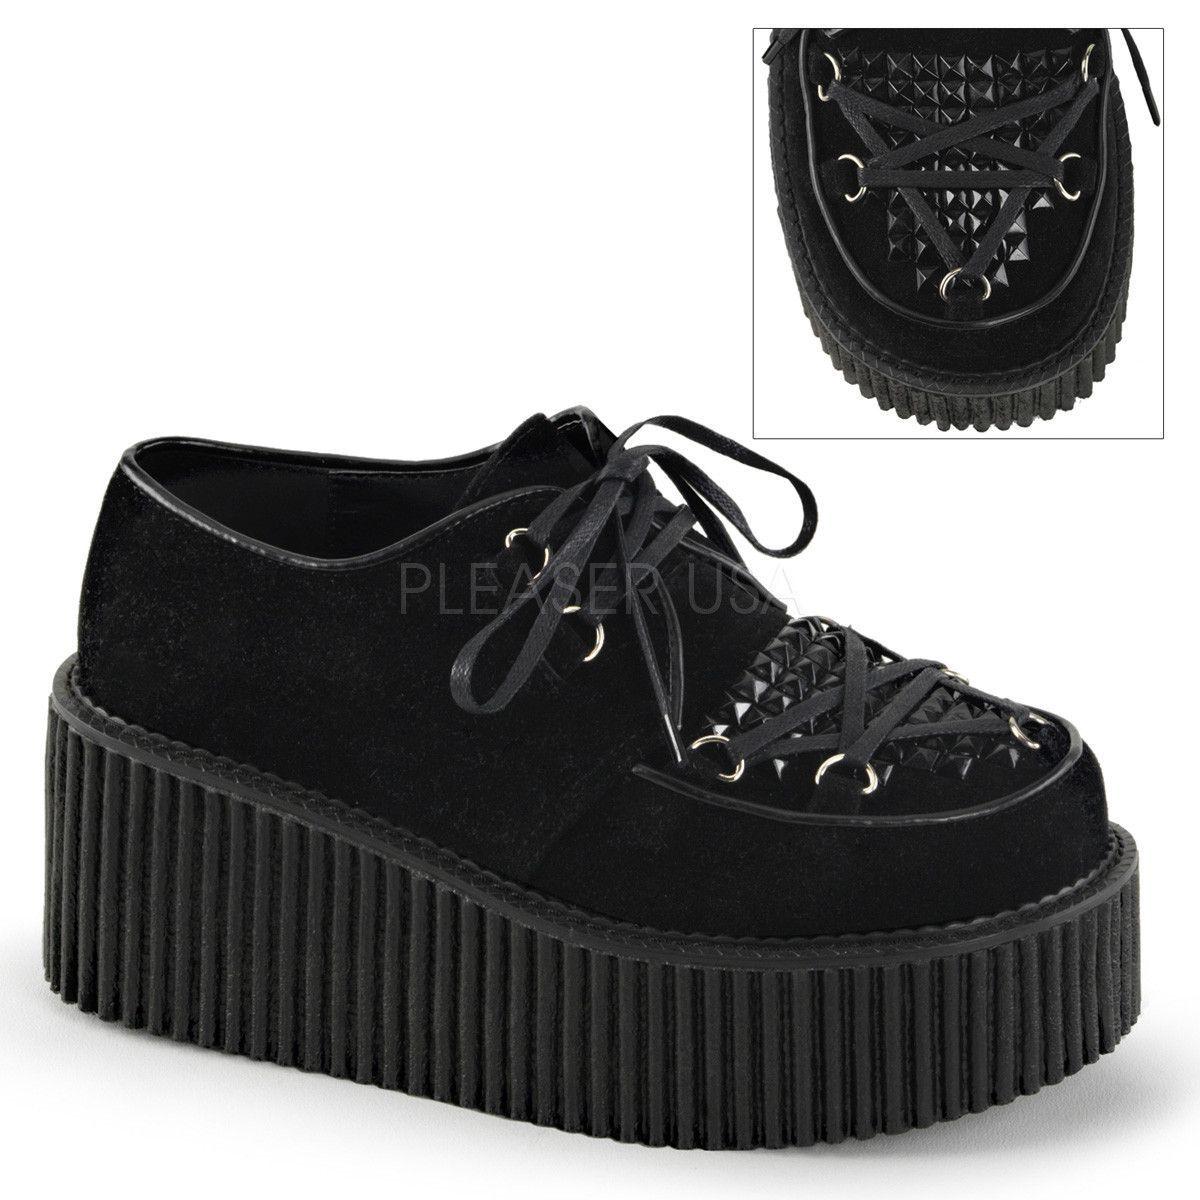 DEMONIA Women/'s Black Vegan Suede Wedge Platform D-Ring Lace Up Creeper Shoes